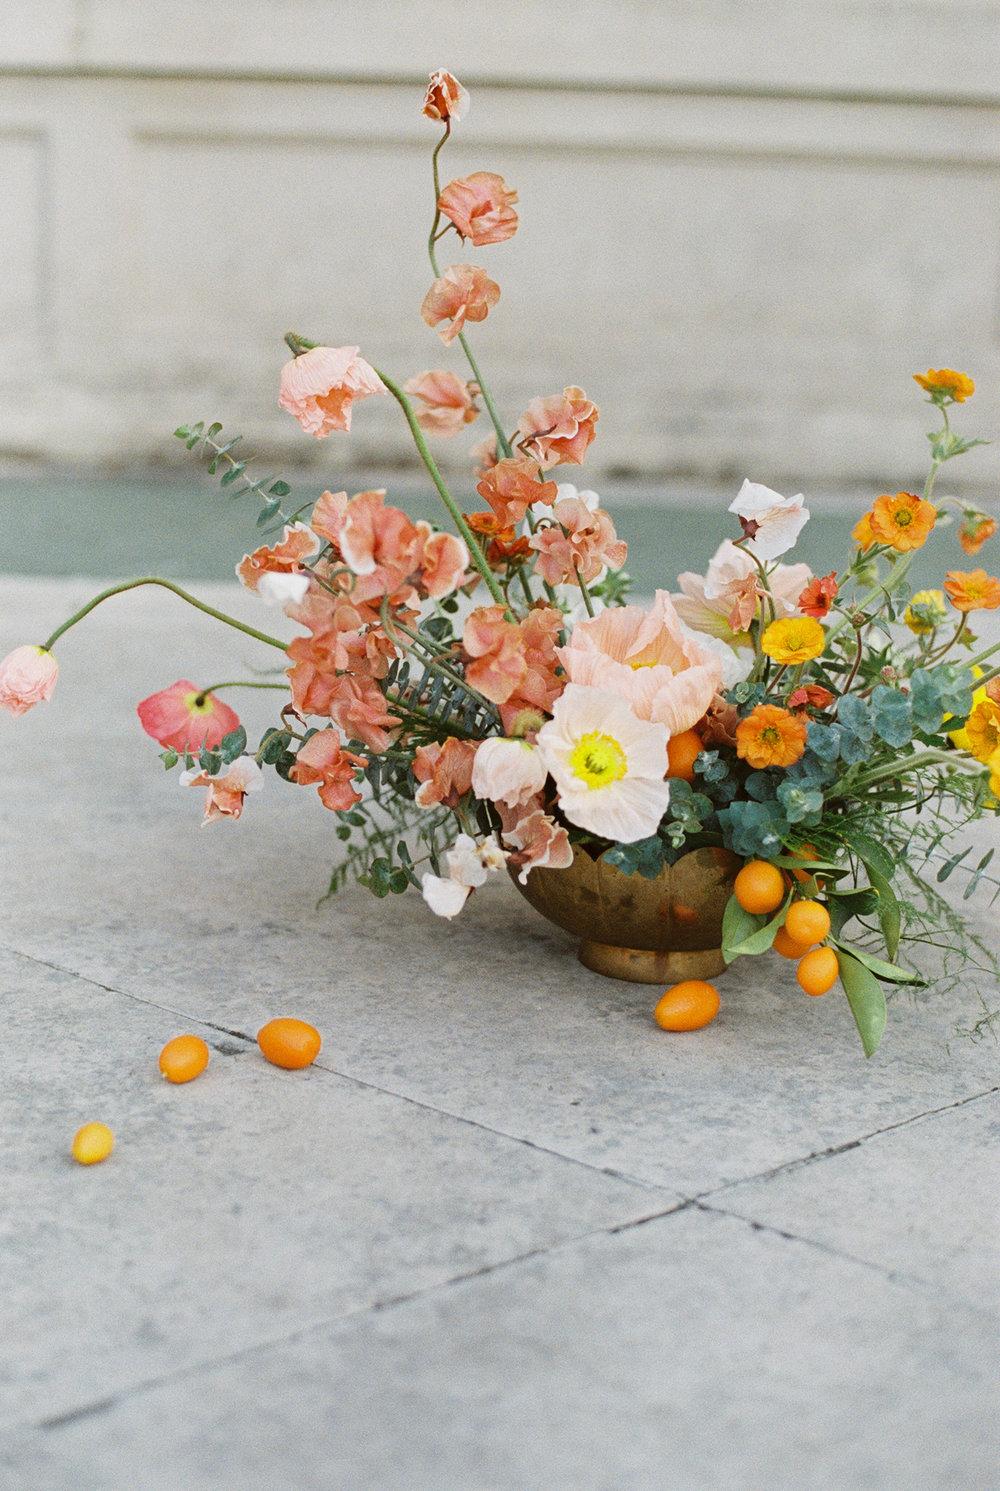 Fine Art Wedding Florist - Dallas, Texas - Olive Grove Design - 00035.jpg